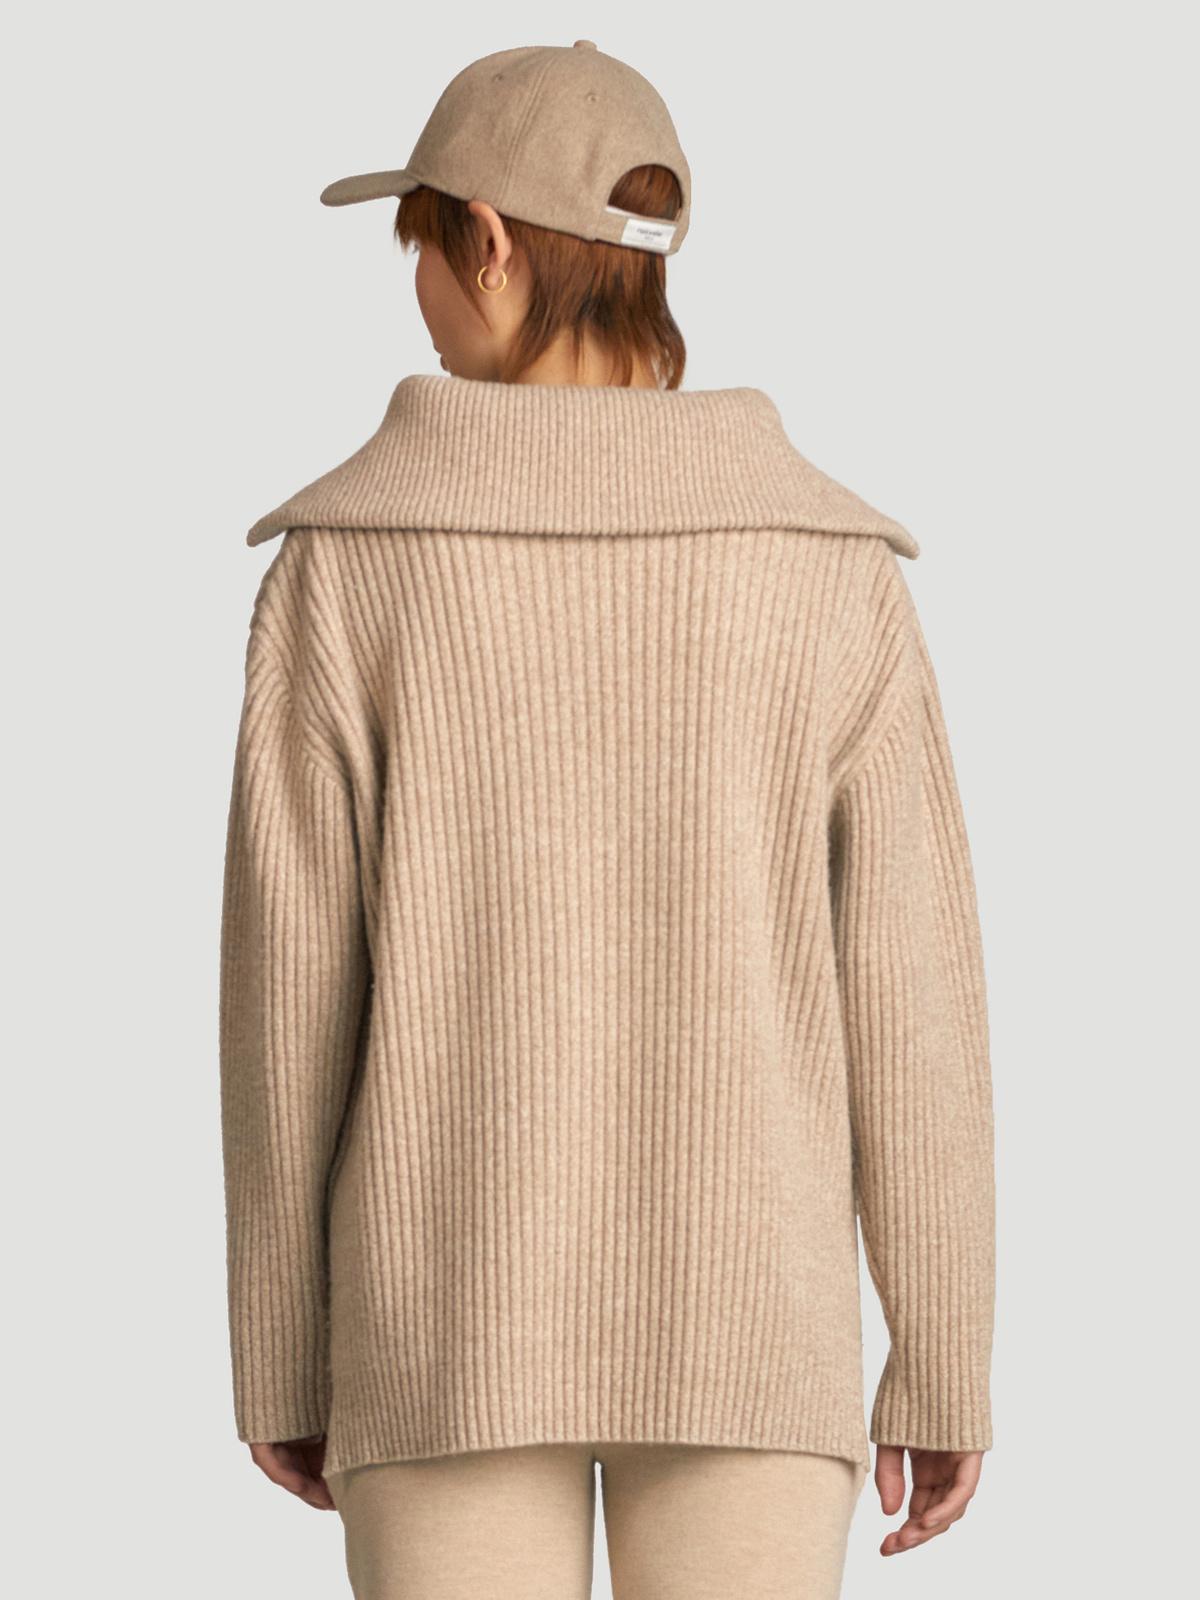 React Knit Sweater  Sand 4